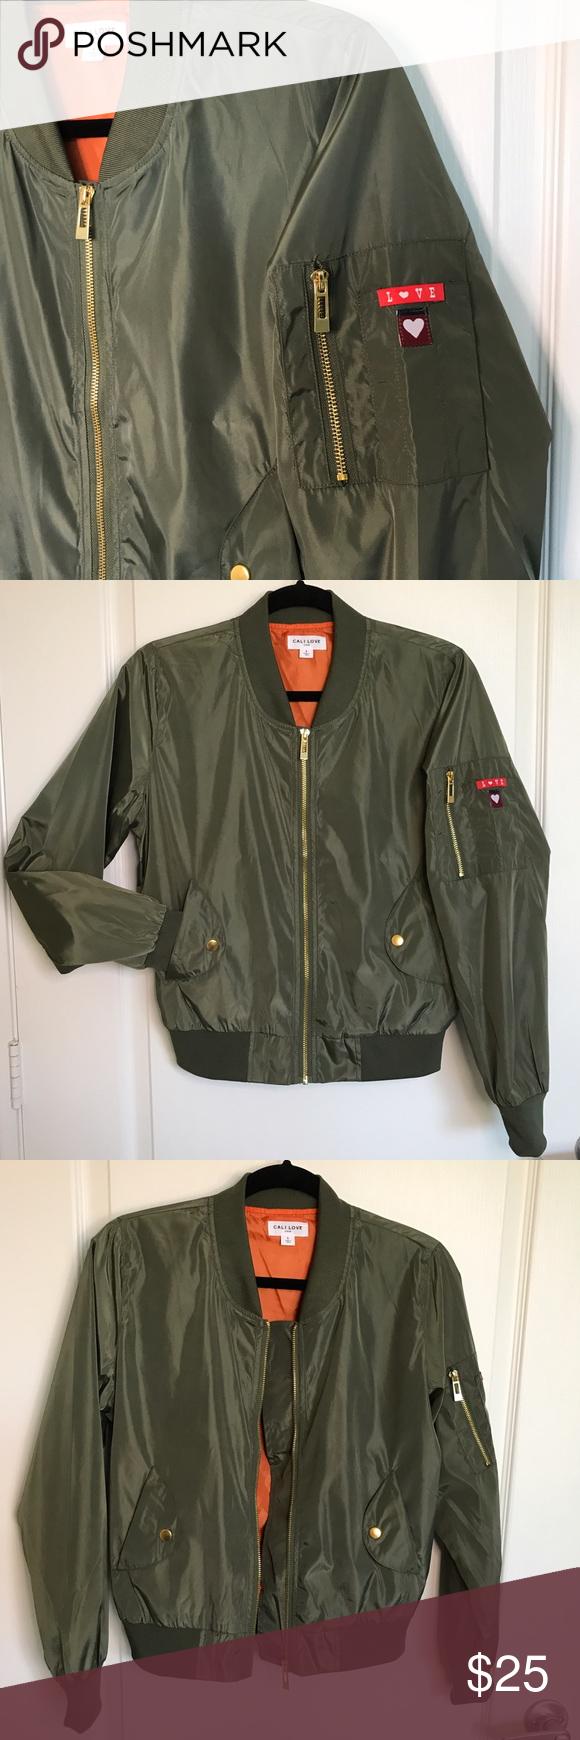 Olive Green Bomber Jacket Cali Love Green Bomber Jacket Olive Green Jacket Bomber Jacket [ 1740 x 580 Pixel ]